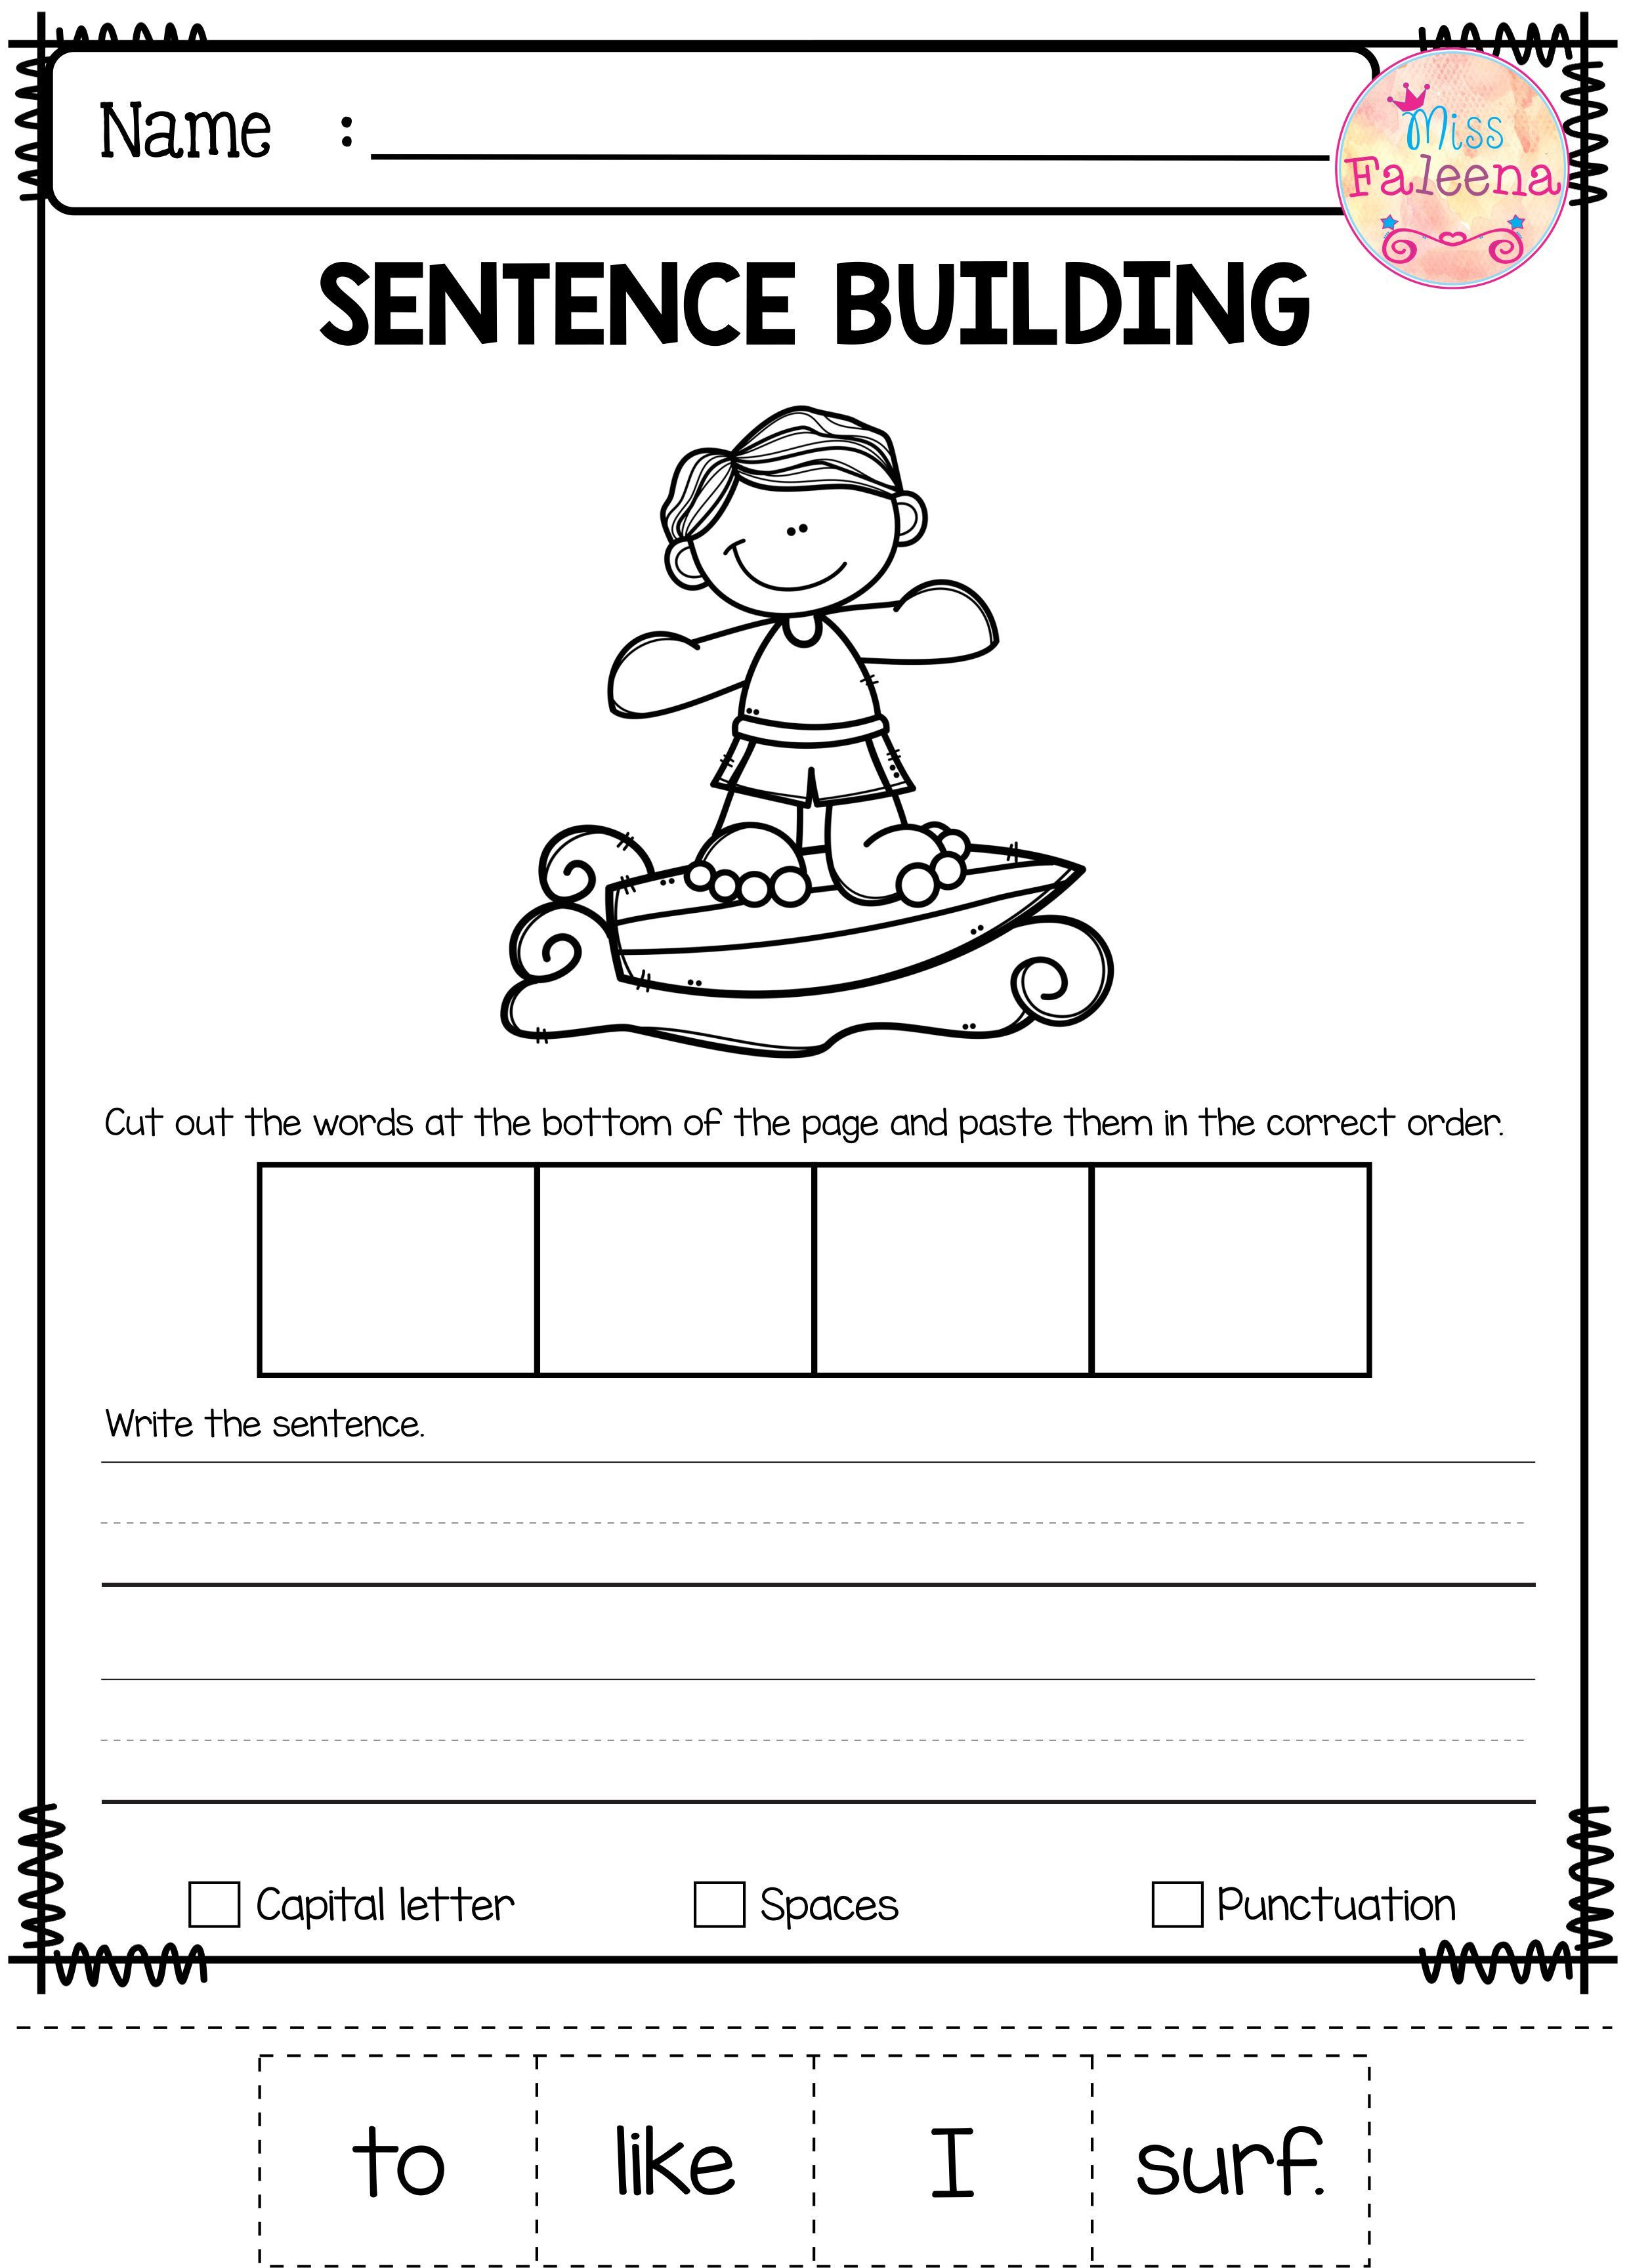 June Sentence Building Has 30 Pages Of Sentence Building